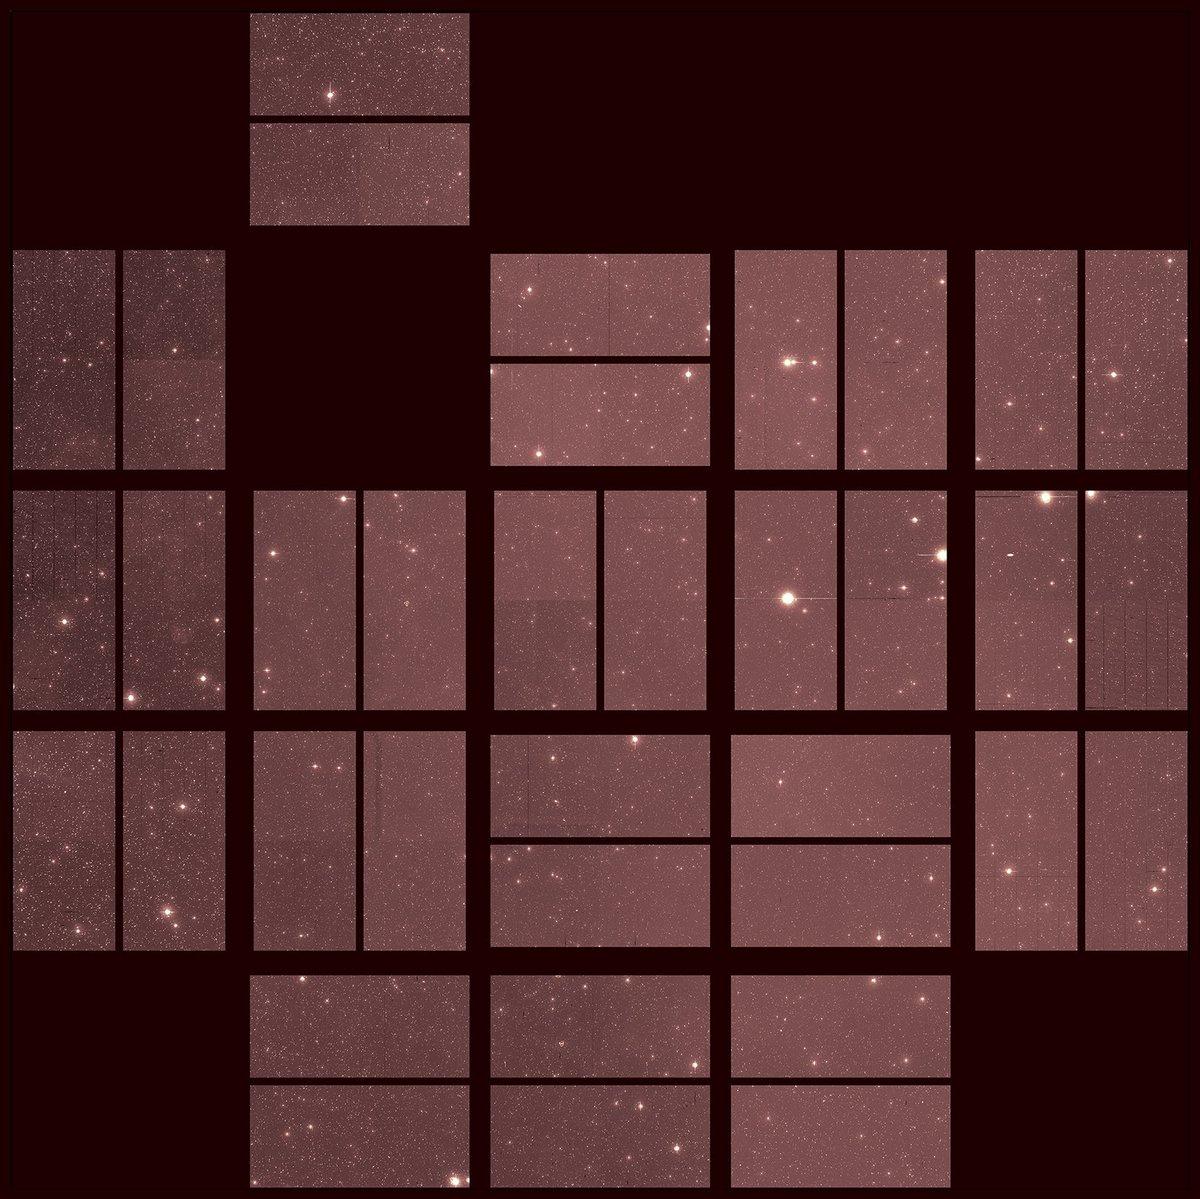 Kepler_lastimage1.jpg